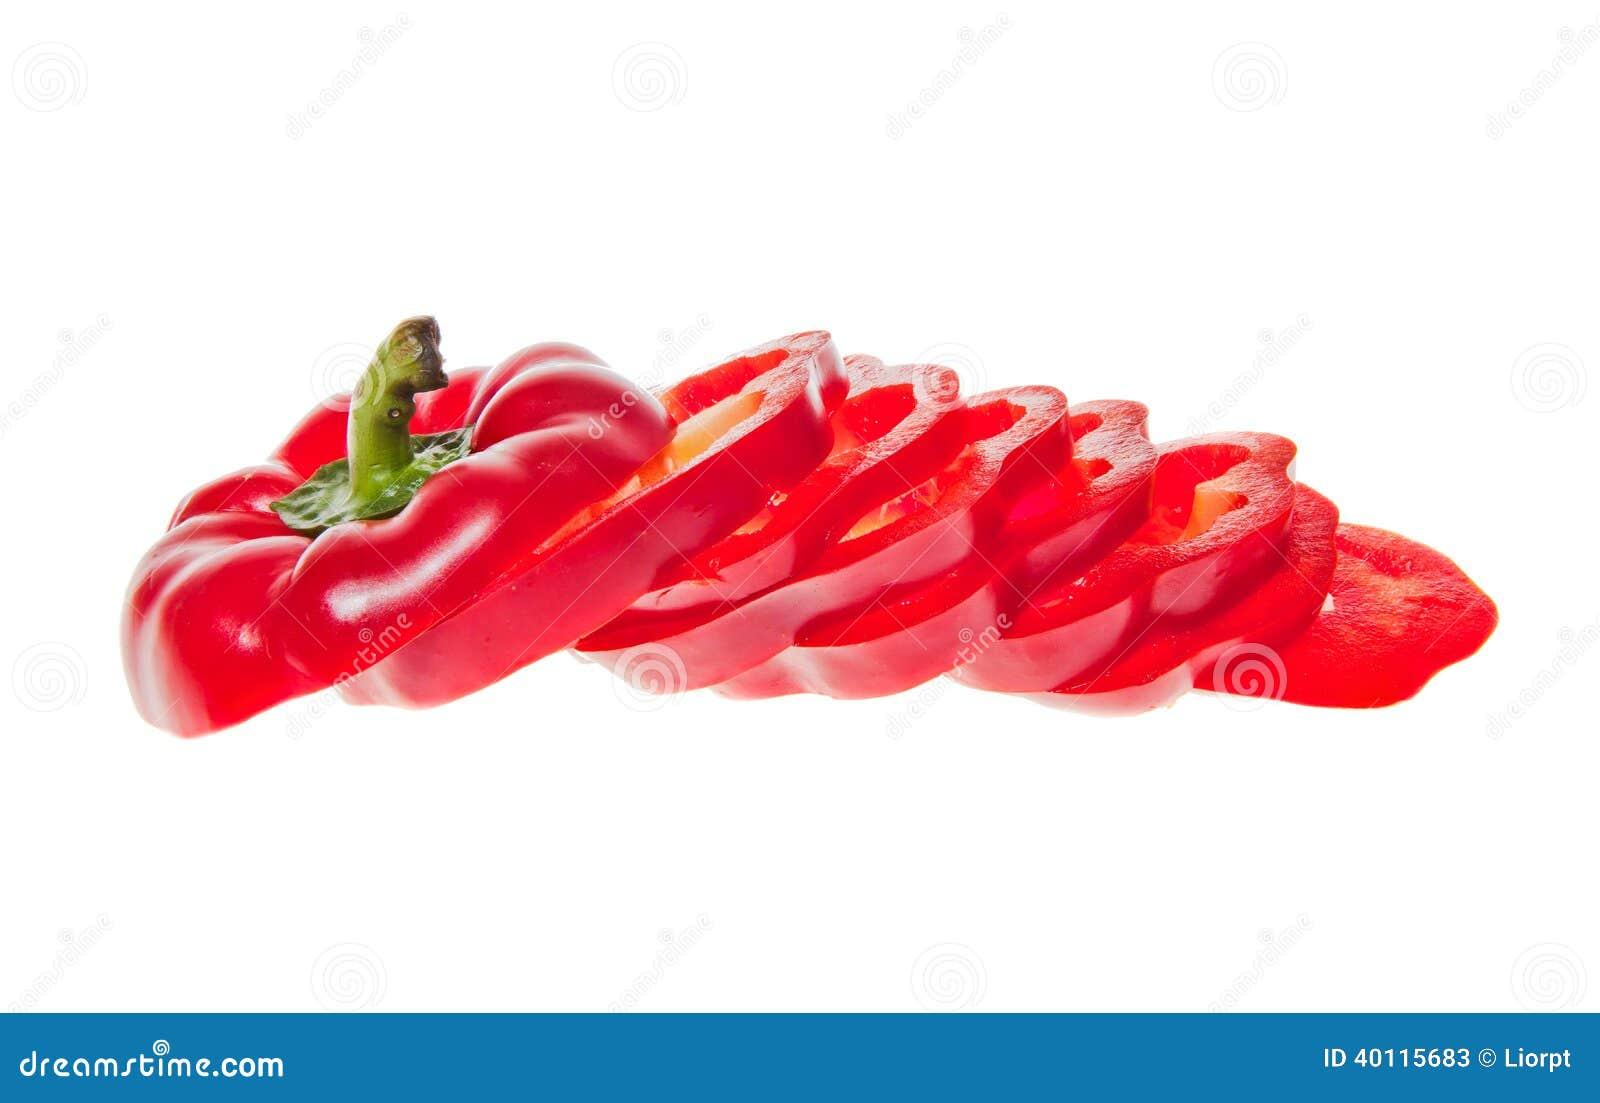 Skivad röd spansk peppar